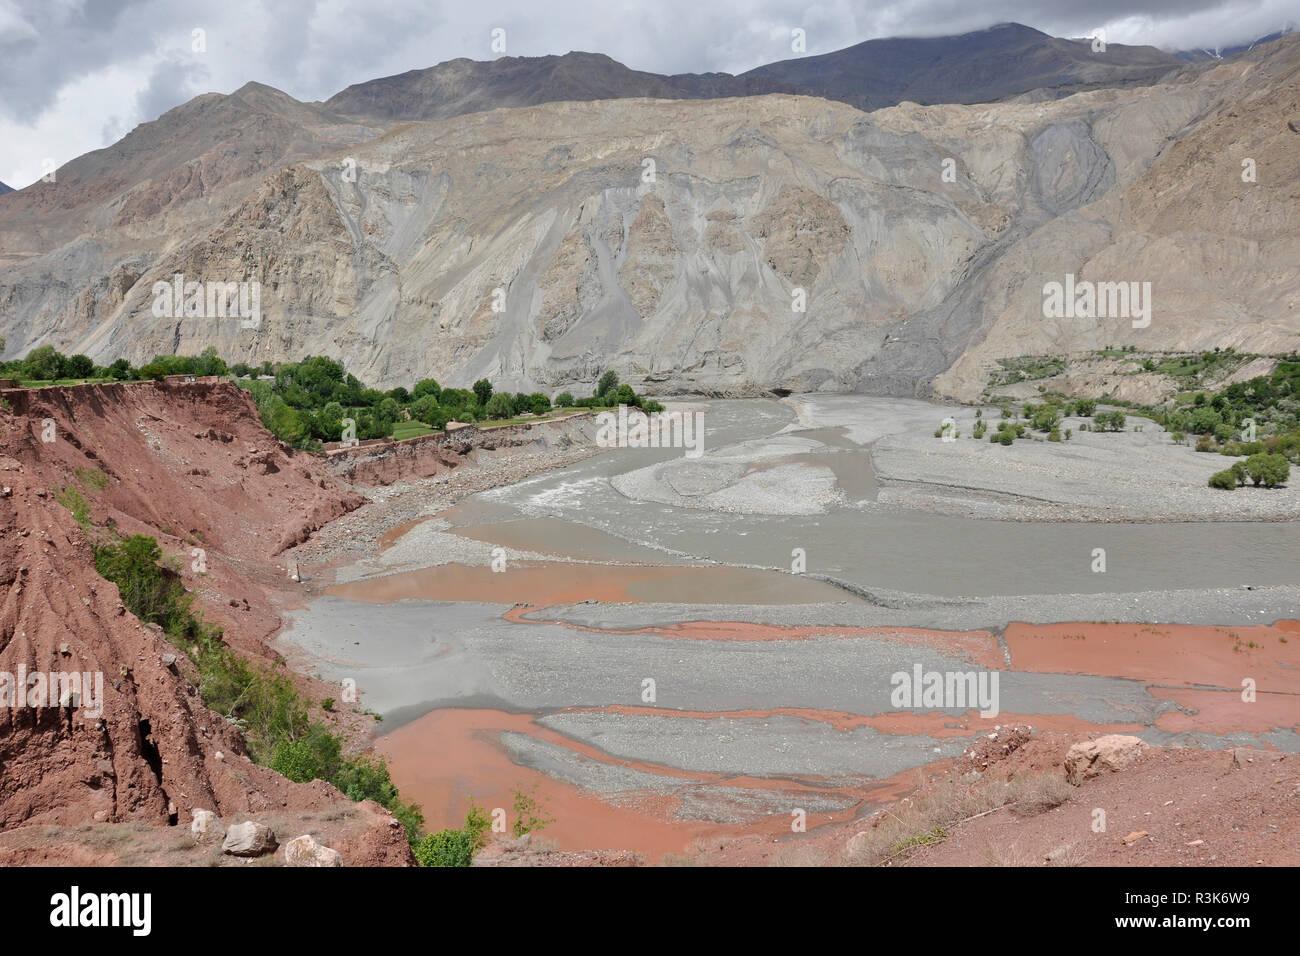 Pakistan, Panjikur plateau, landscape - Stock Image